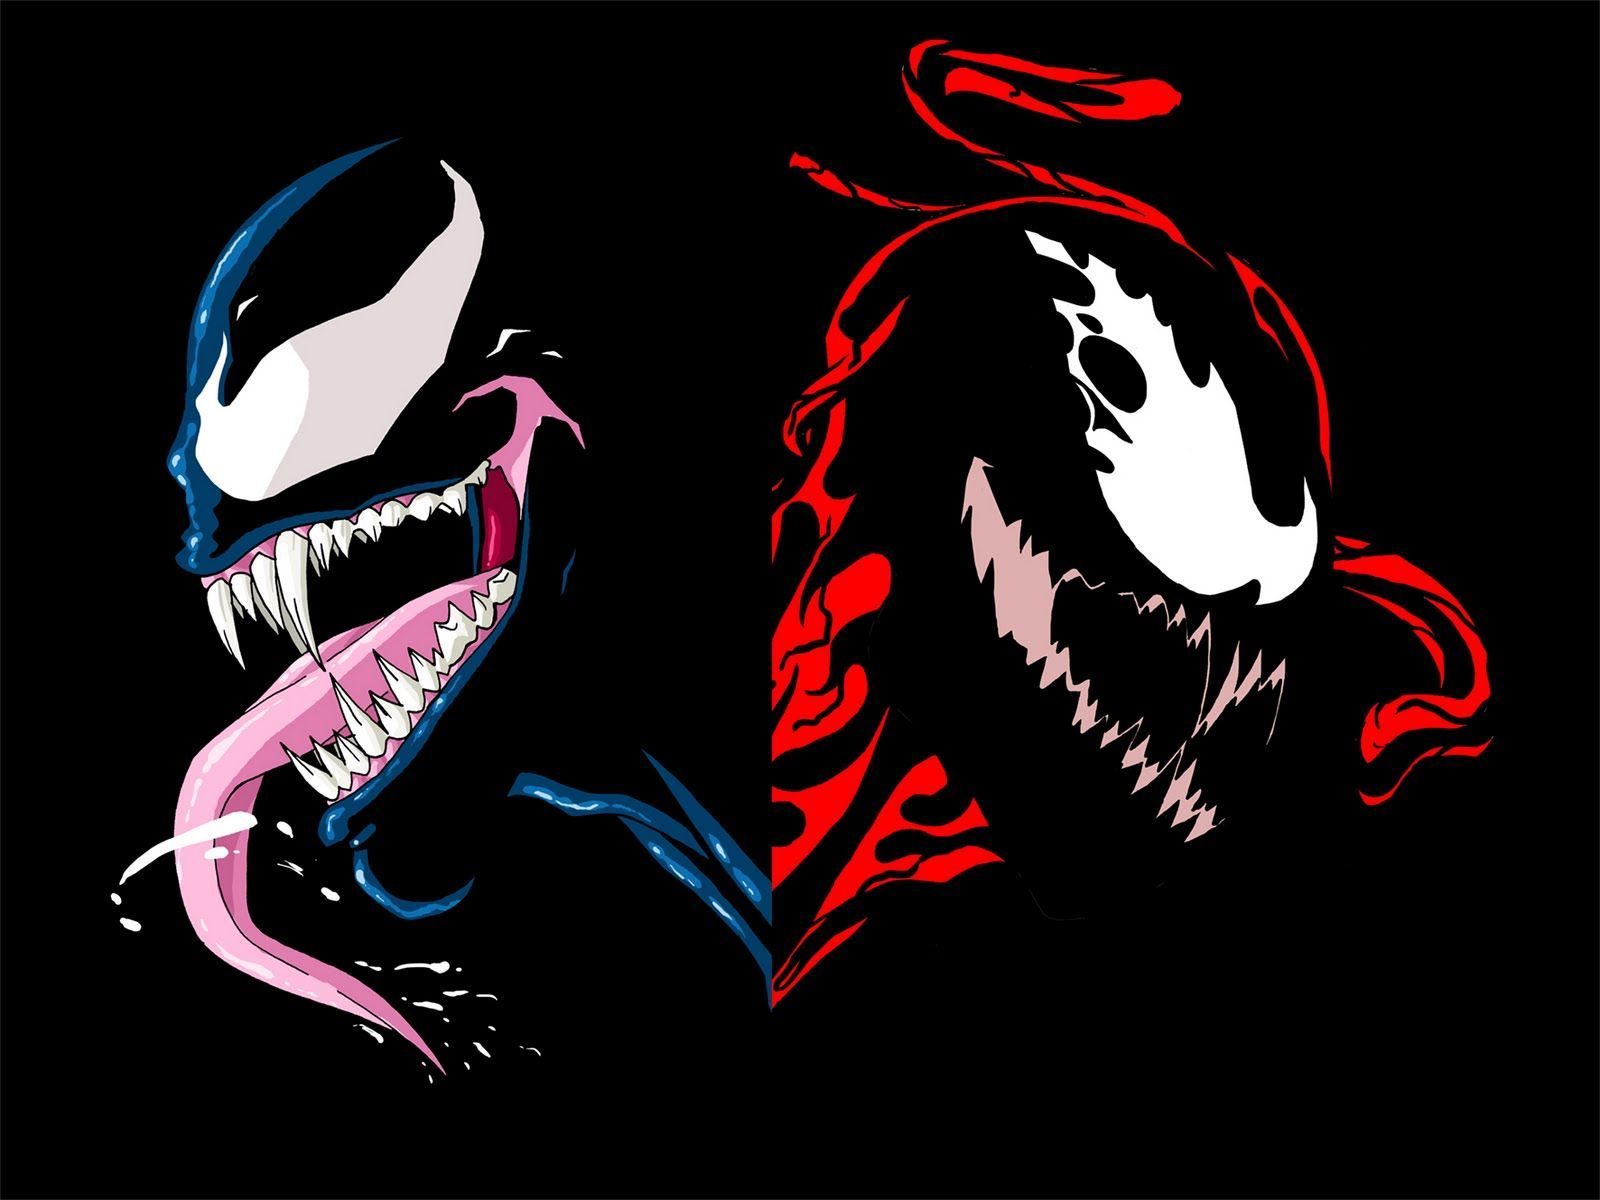 Dark Of Venom And Carnage Wallpaper Creative graphics Action 1600x1200